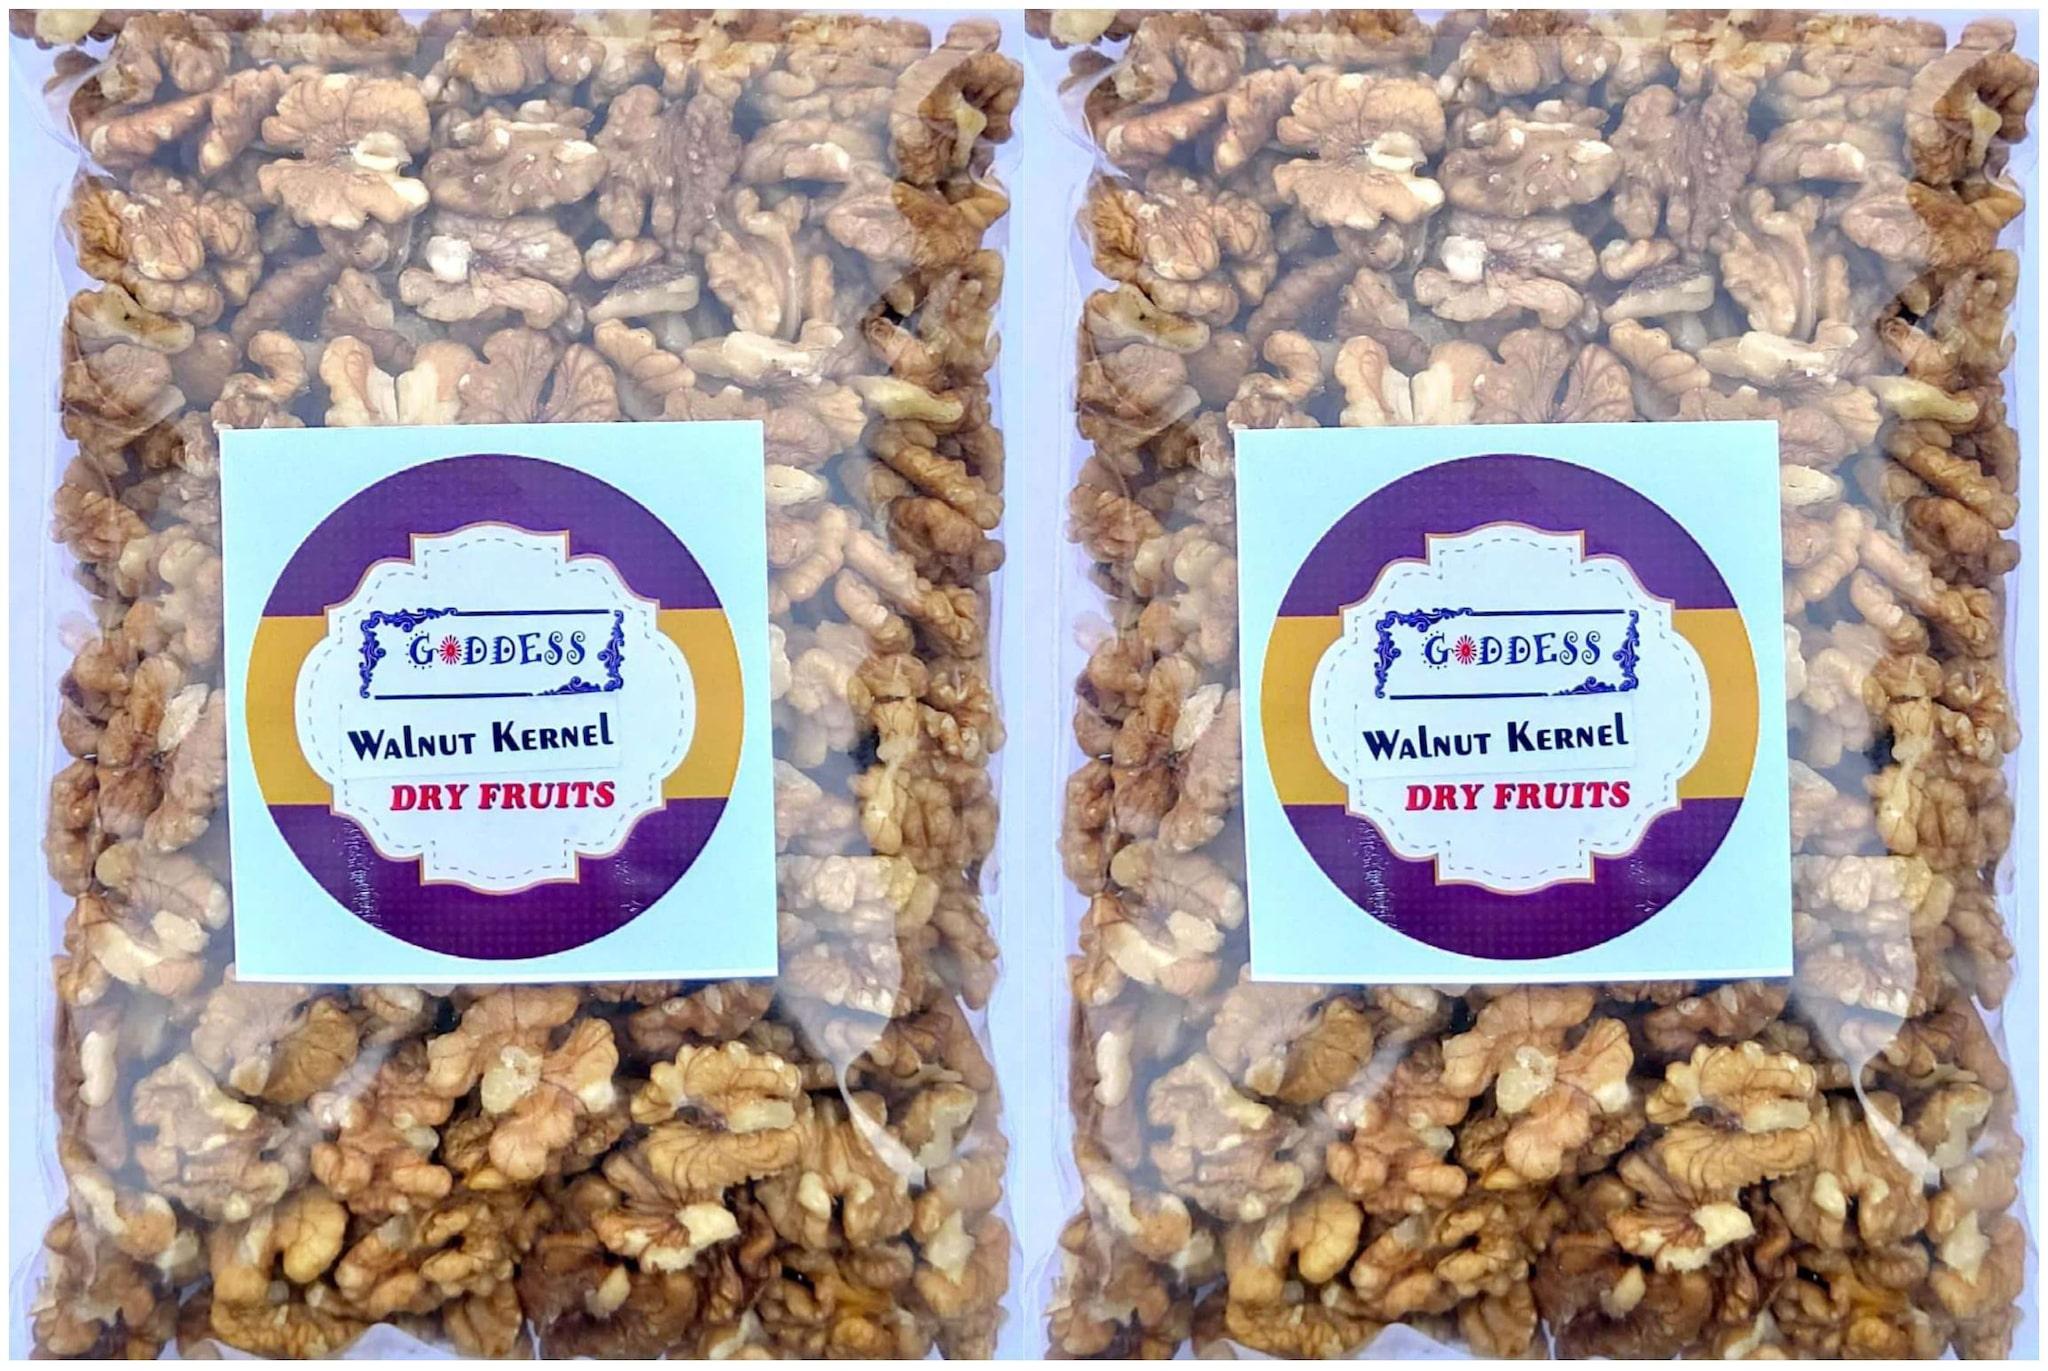 Goddess Premium Walnuts Kernels 450 g each  Pack of 2